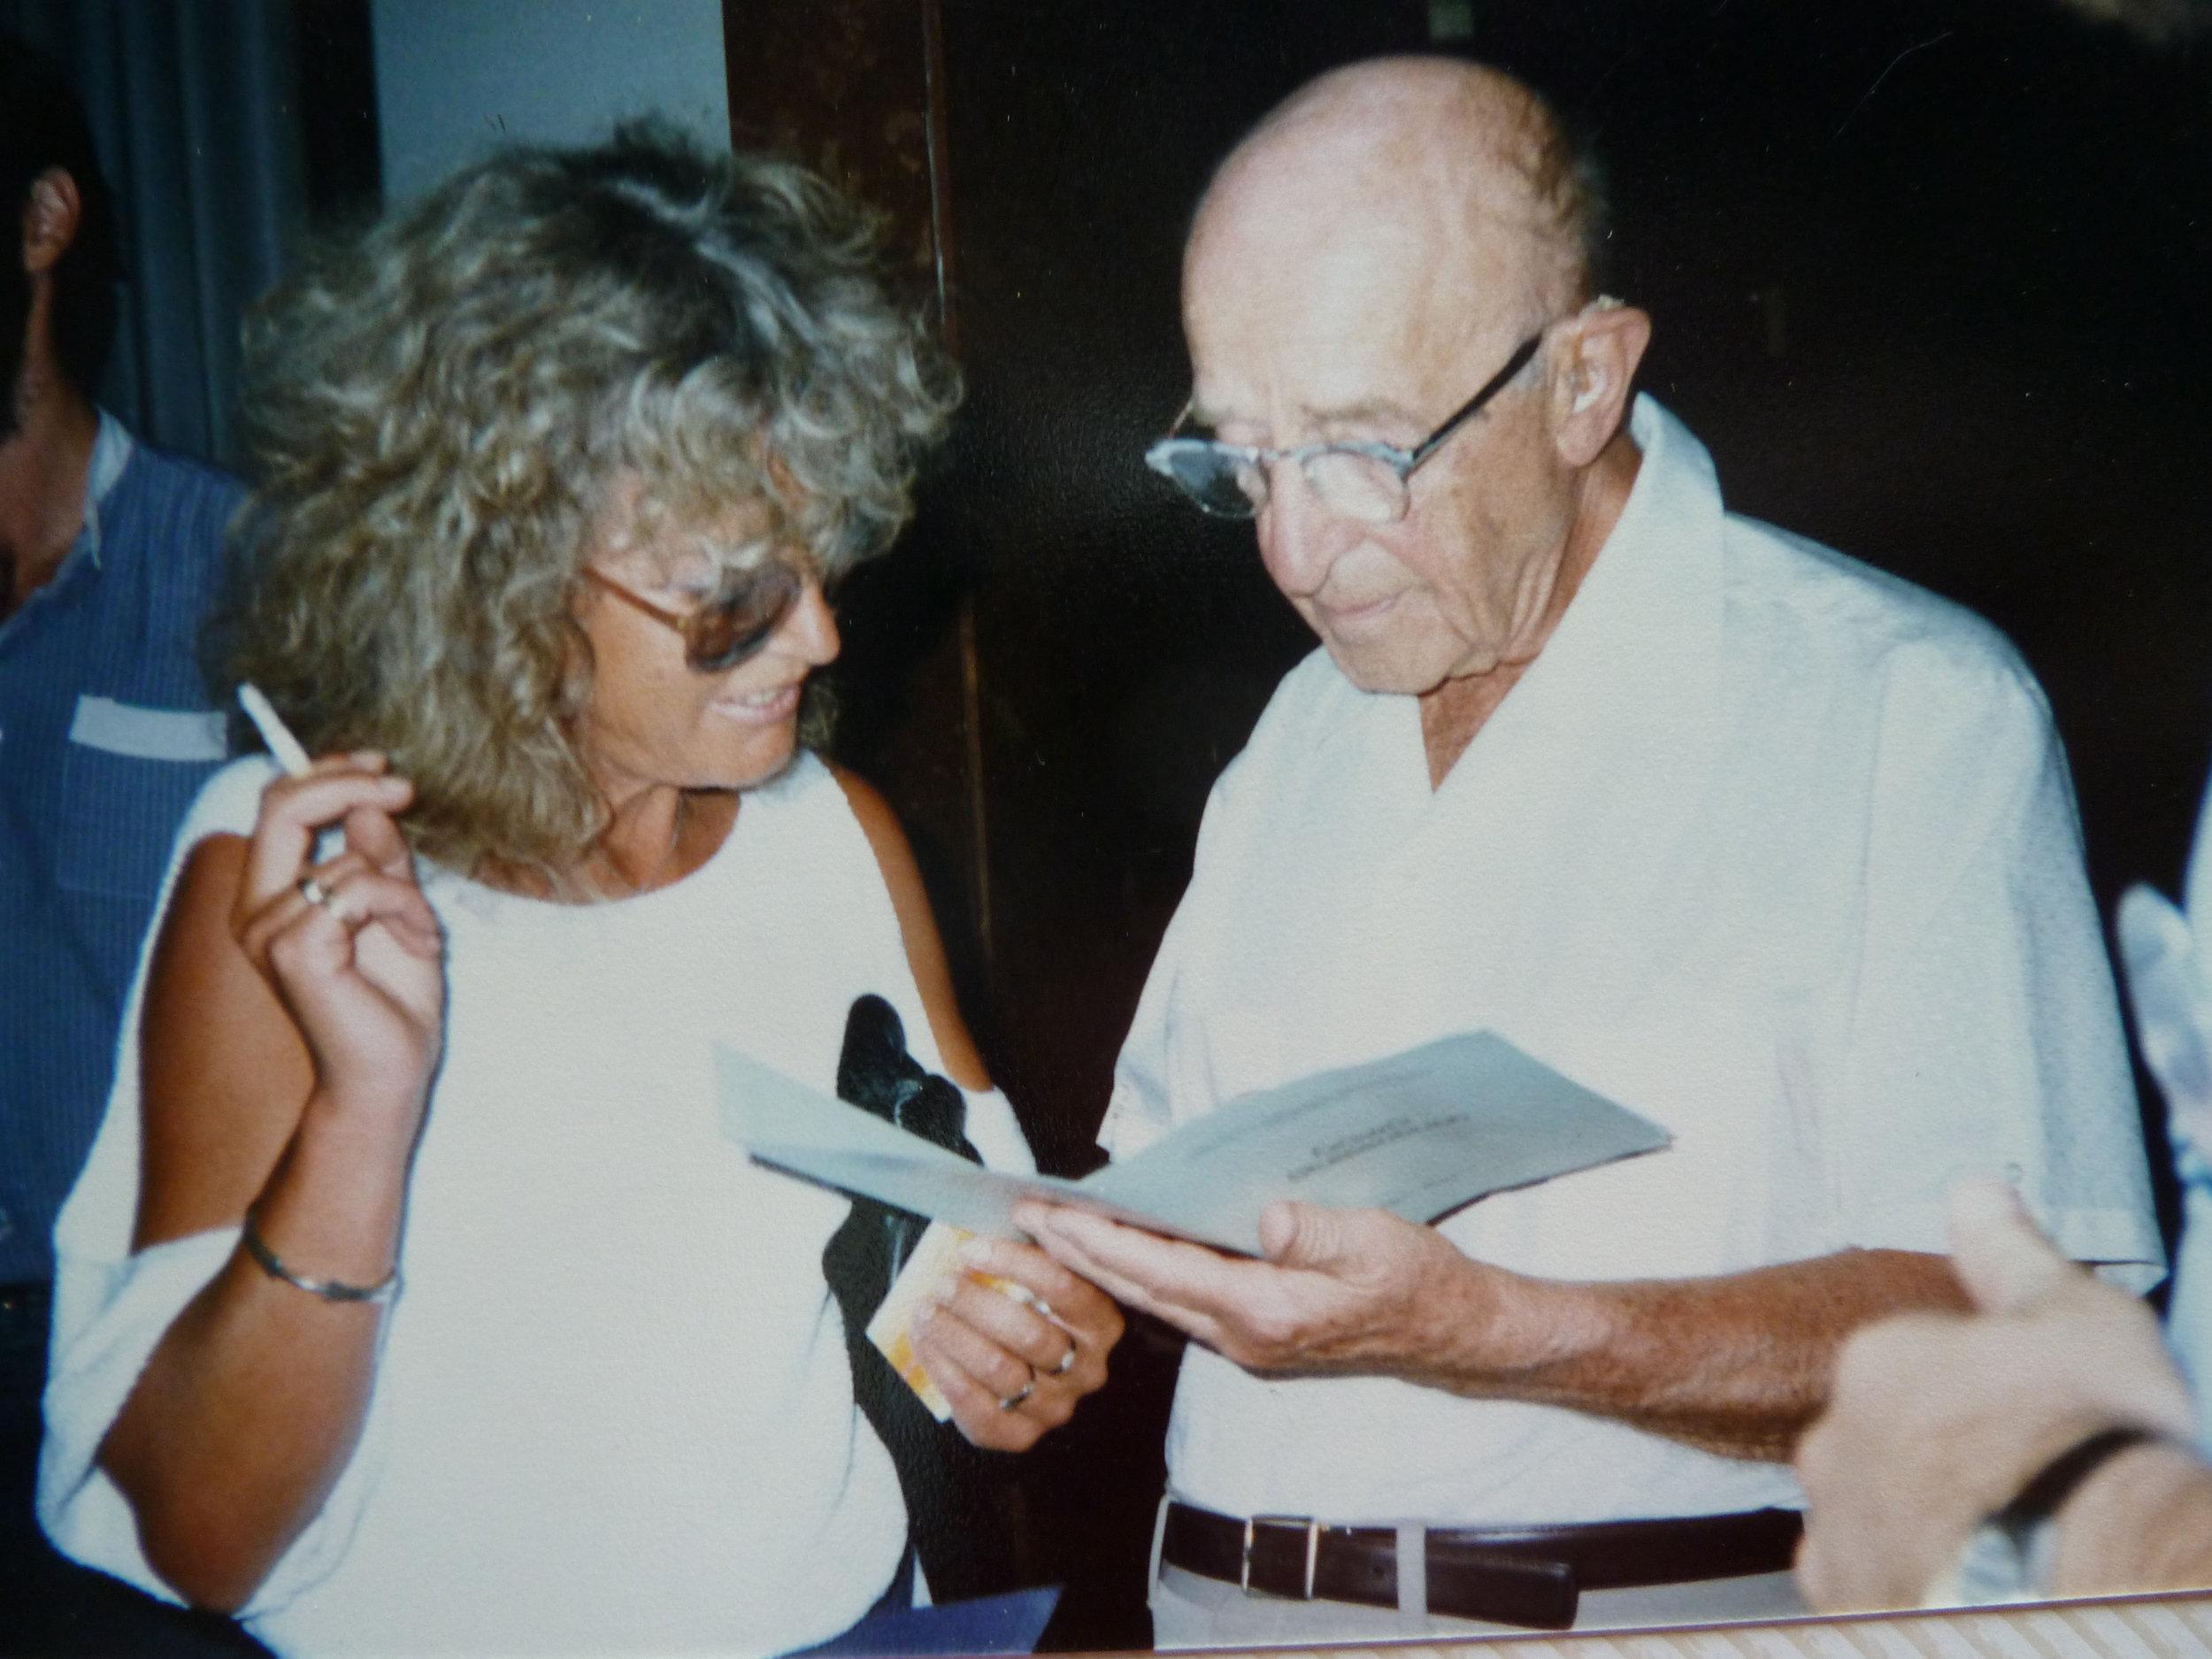 Helga Teml mit Carl Rogers (und Zigarette!), 1986, Cross-Cultural-Communication, Szeged, Ungarn